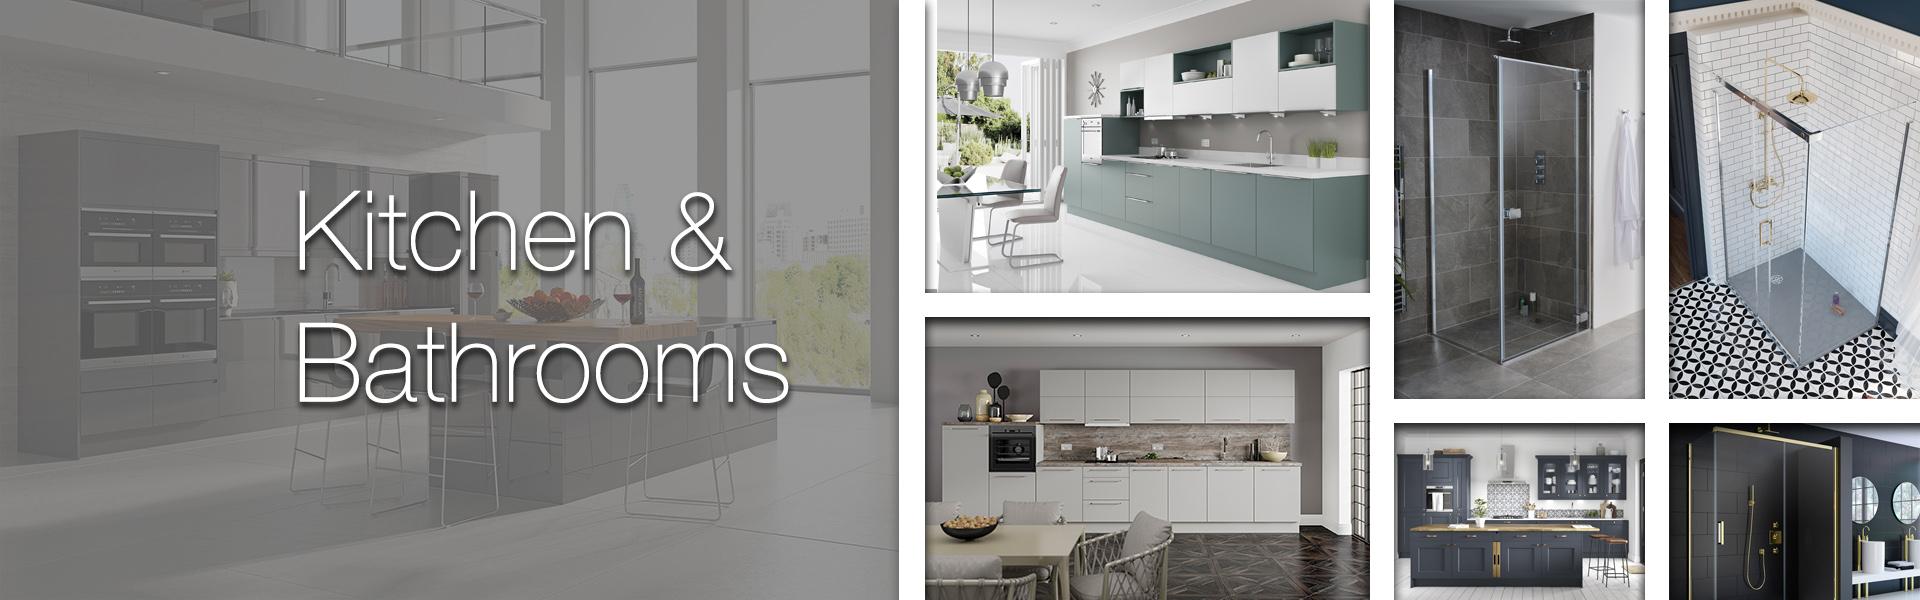 Kitchen and bathrooms frank key nottingham sheffield